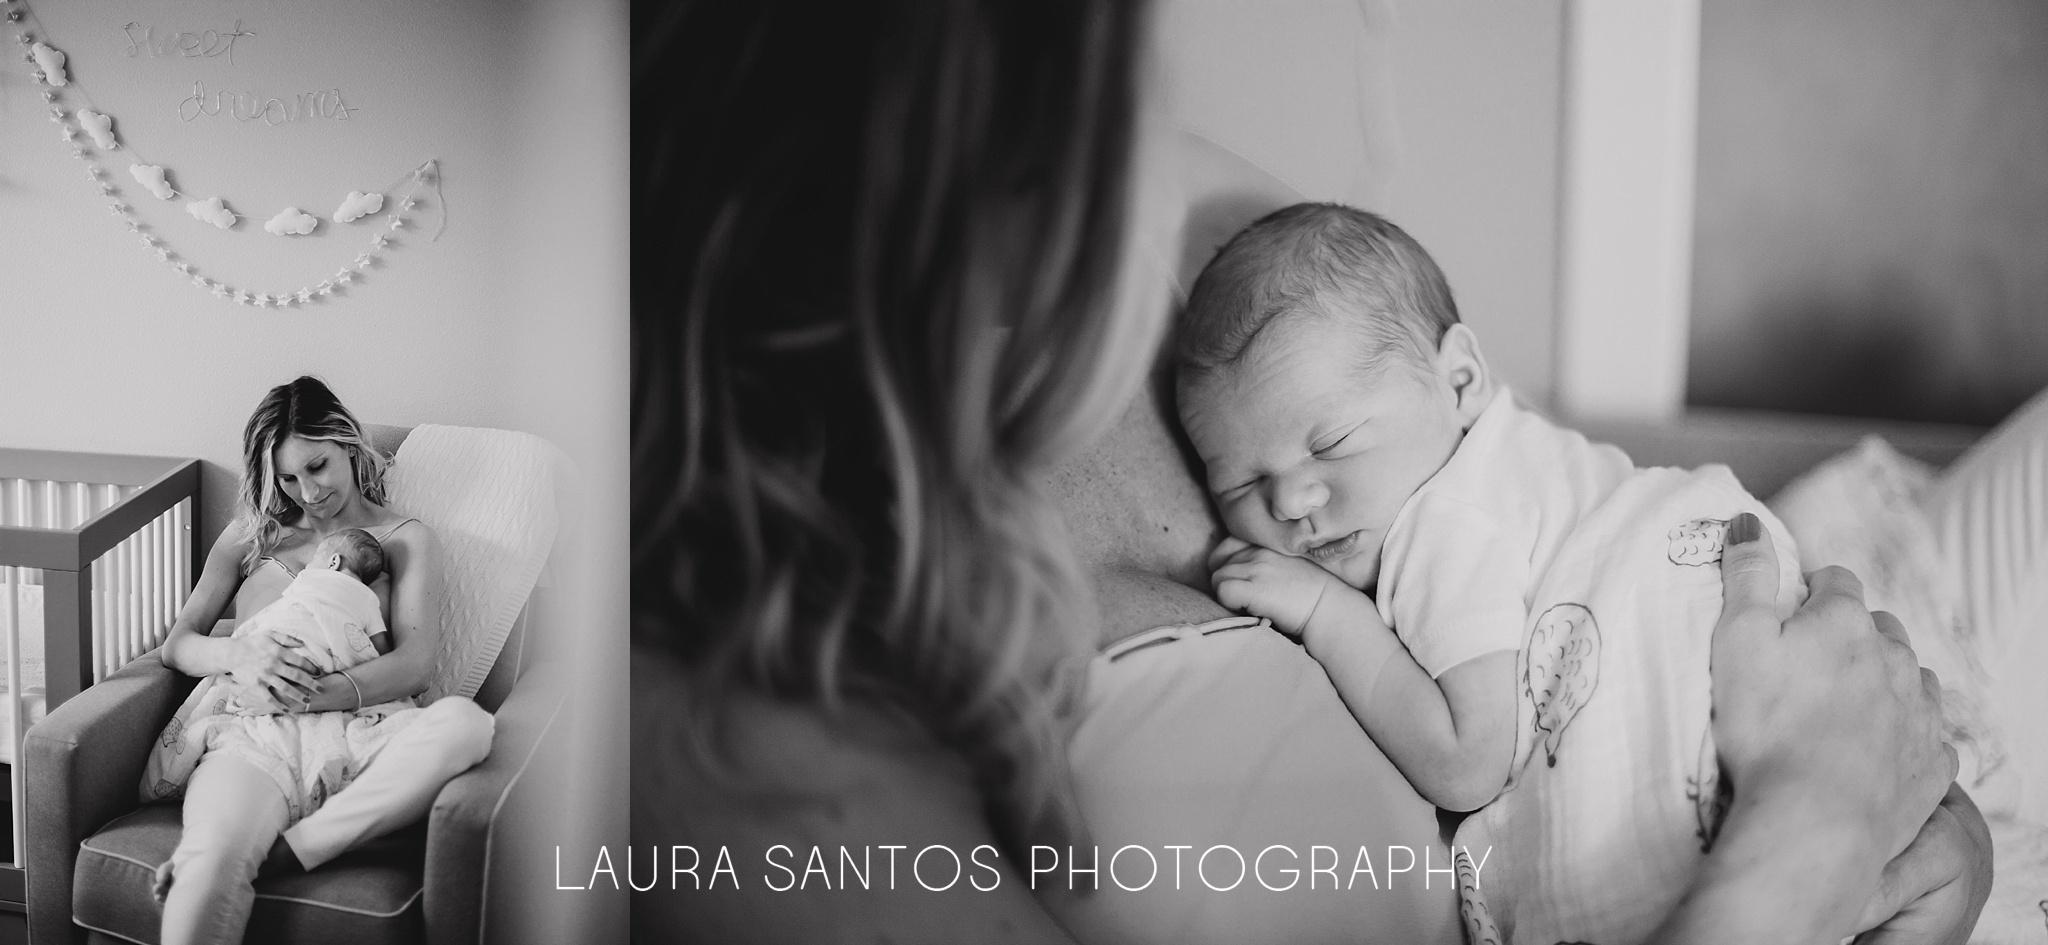 Laura Santos Photography Portland Oregon Family Photographer_0300.jpg